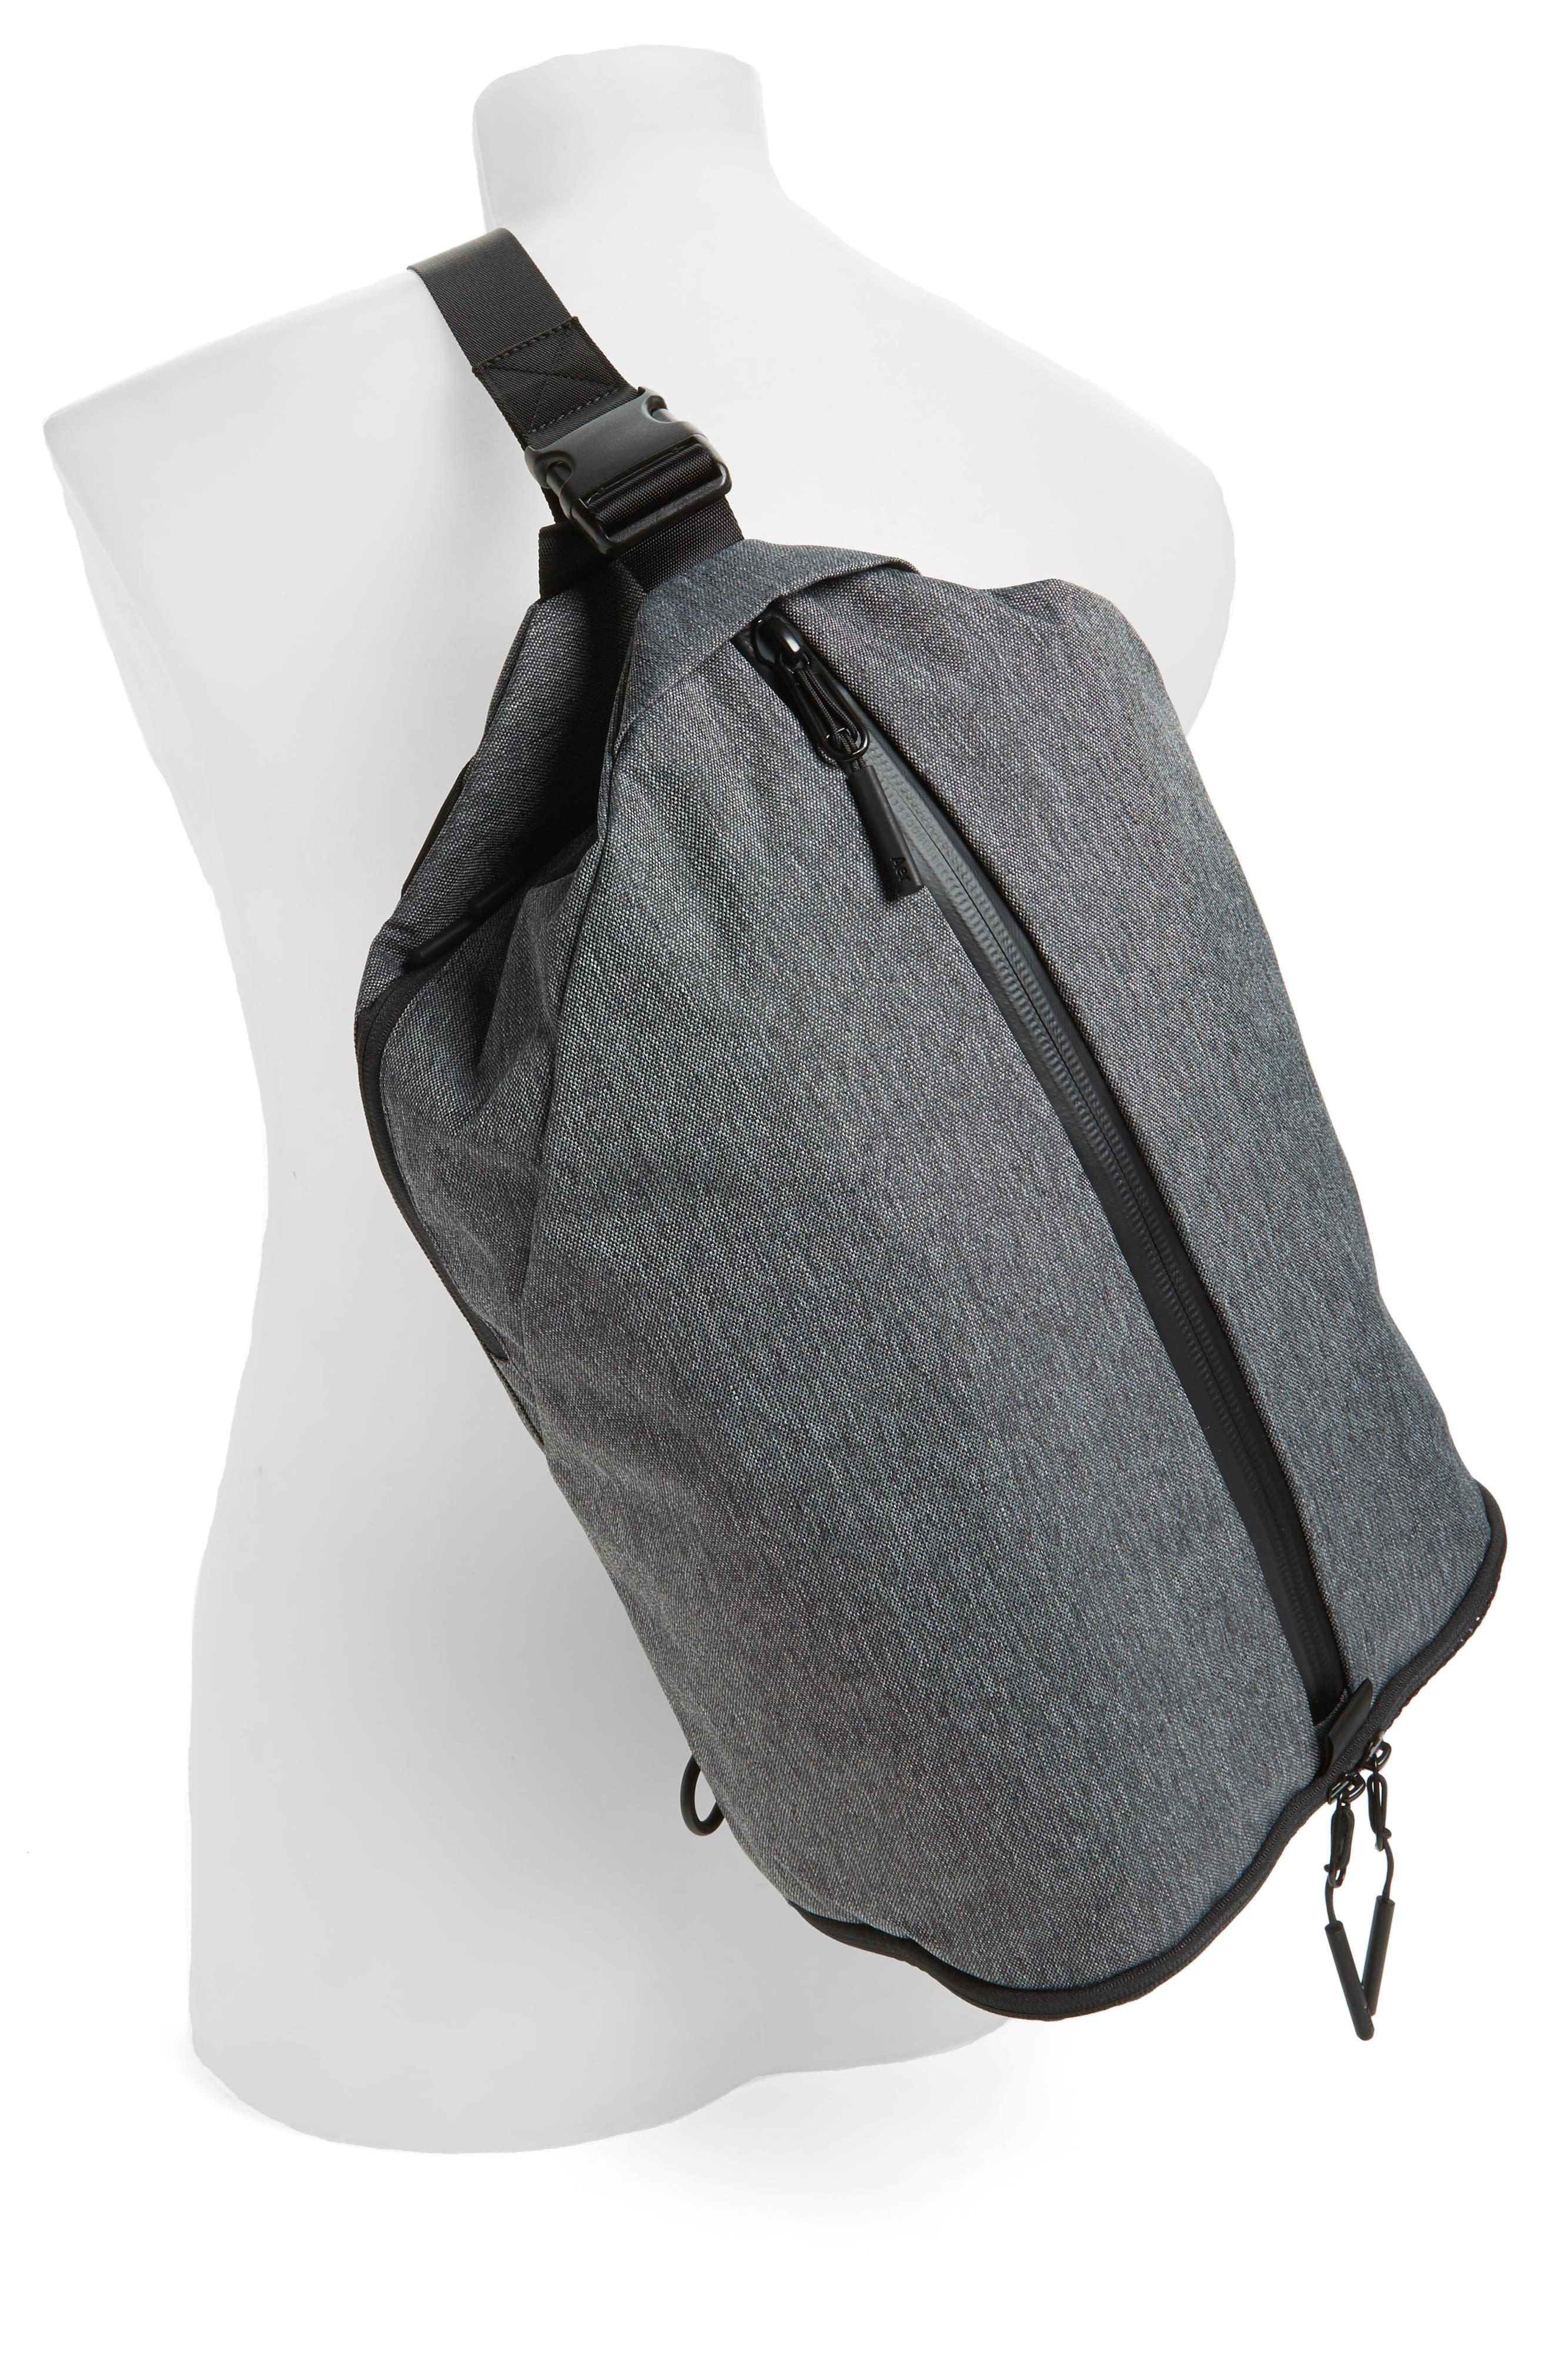 Alternate Image 2  - Aer Sling Bag 2 Sling